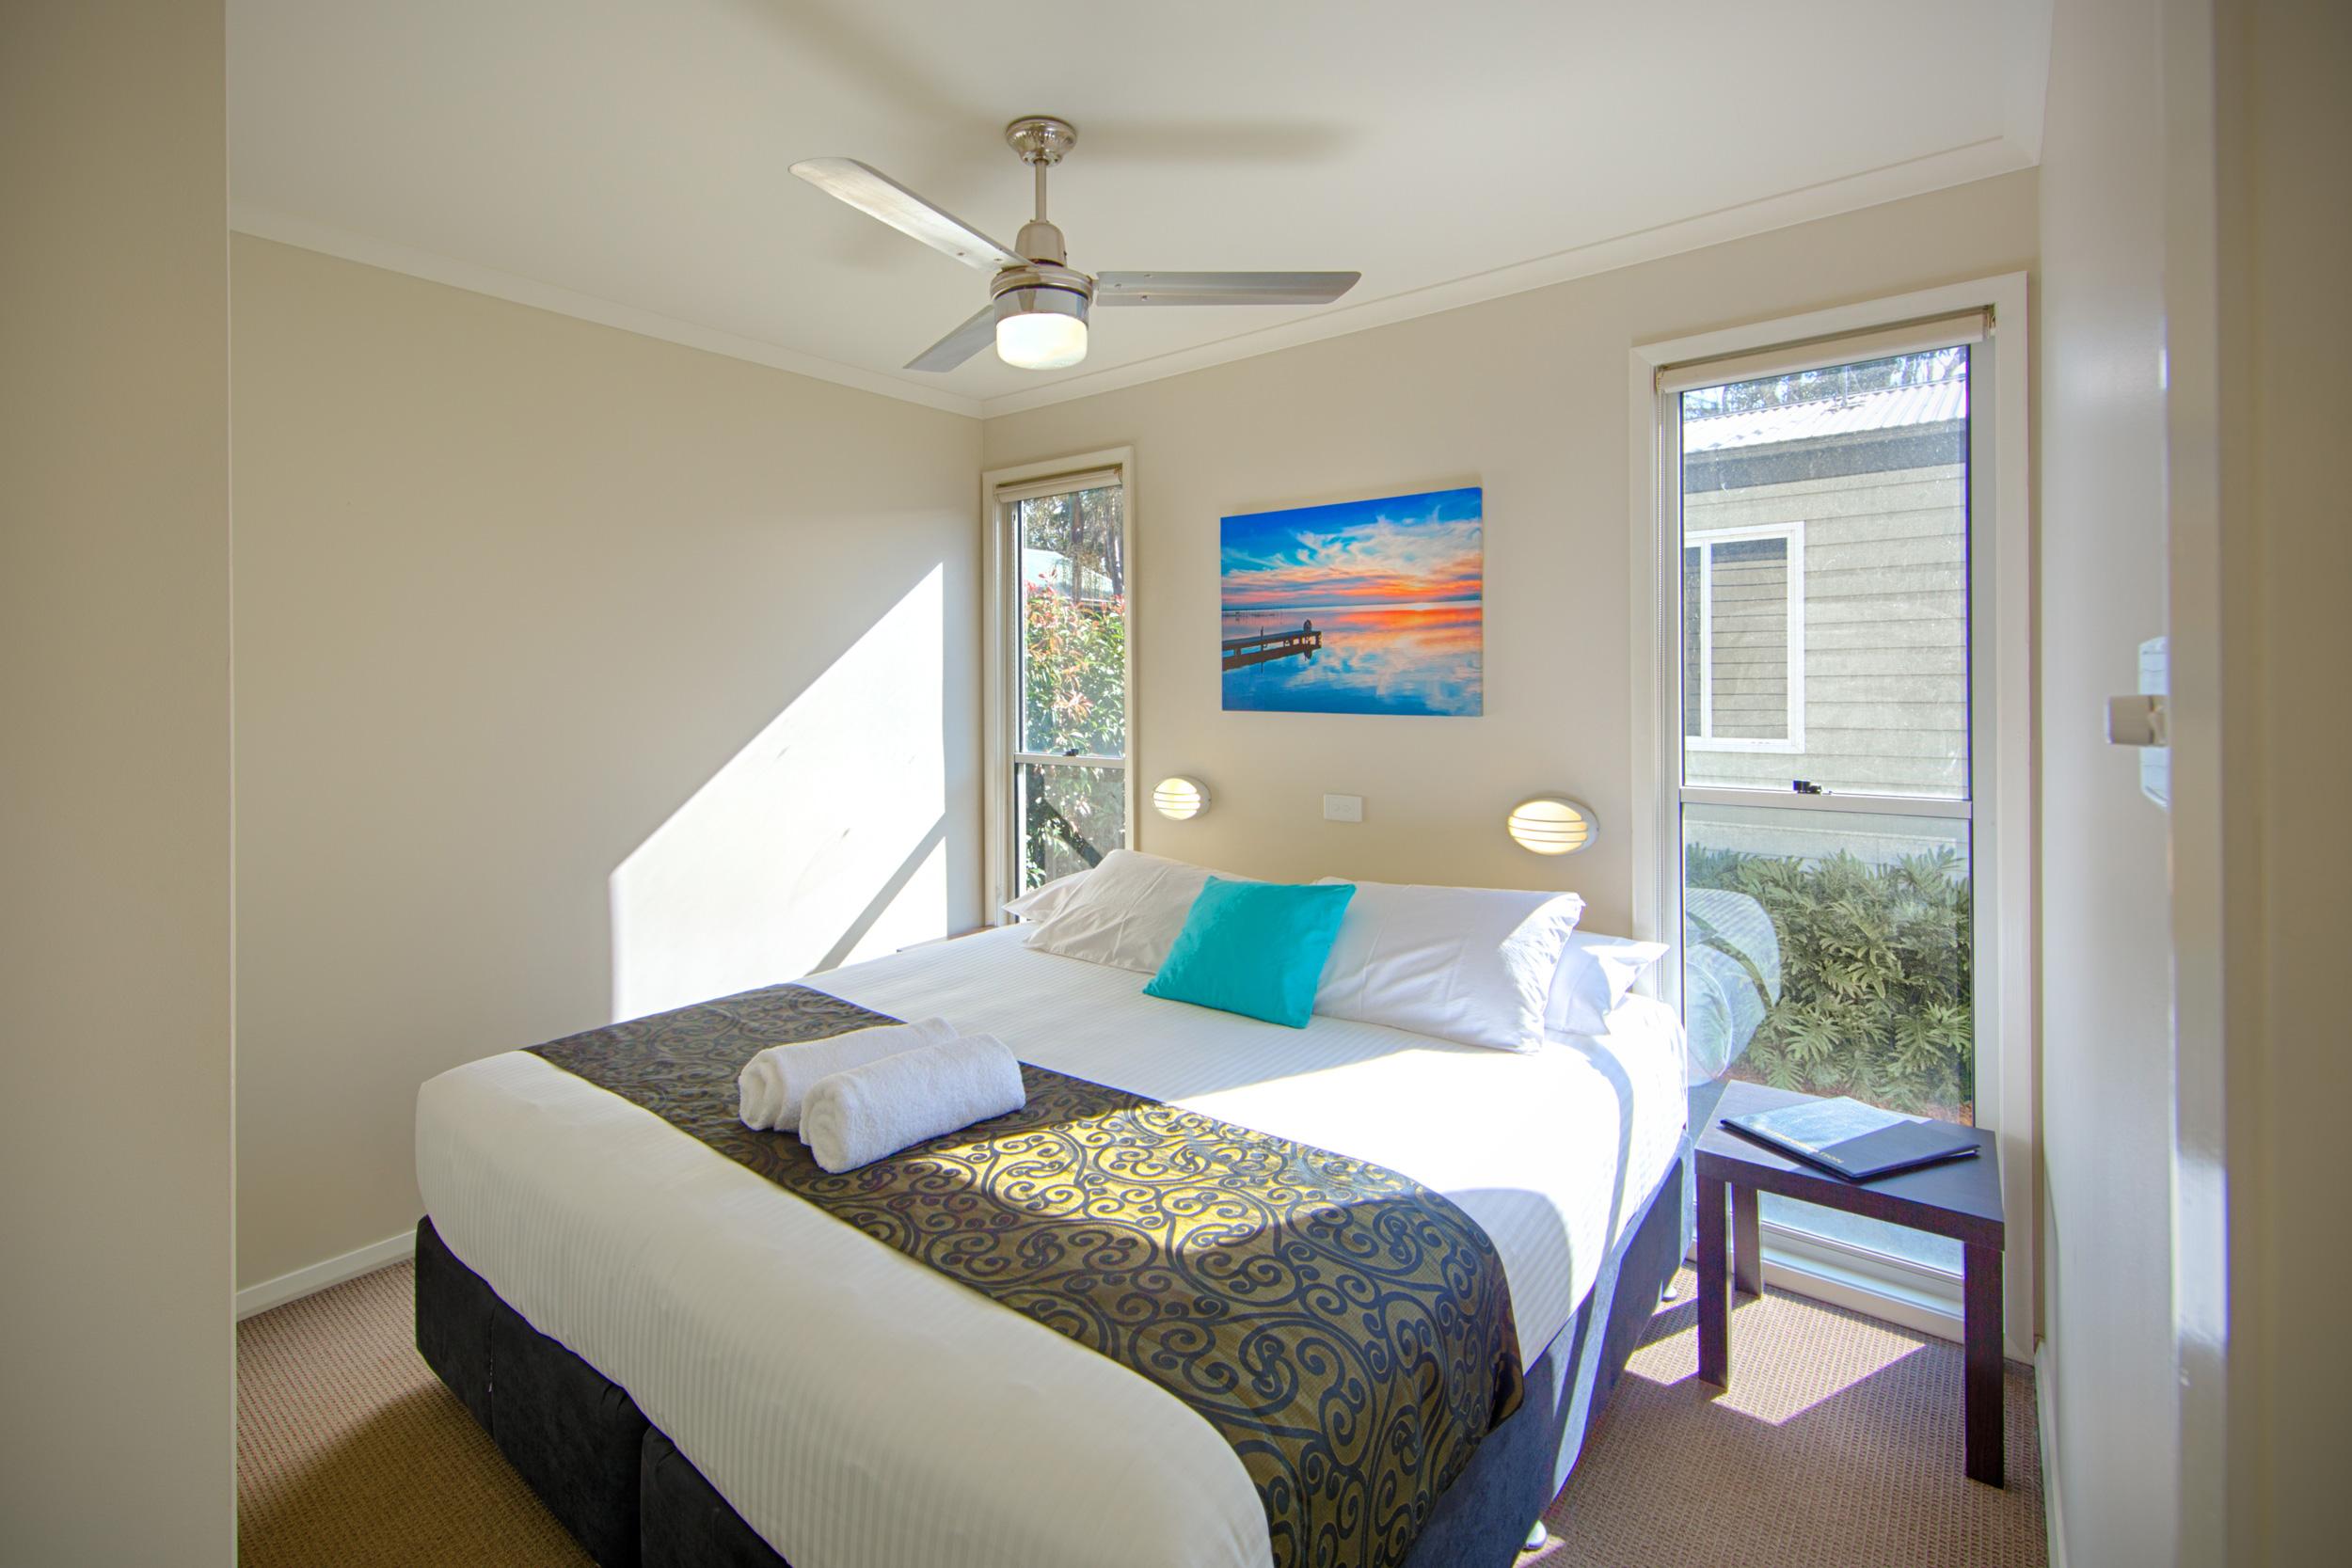 Villa-Pic-3-main-bed.jpg